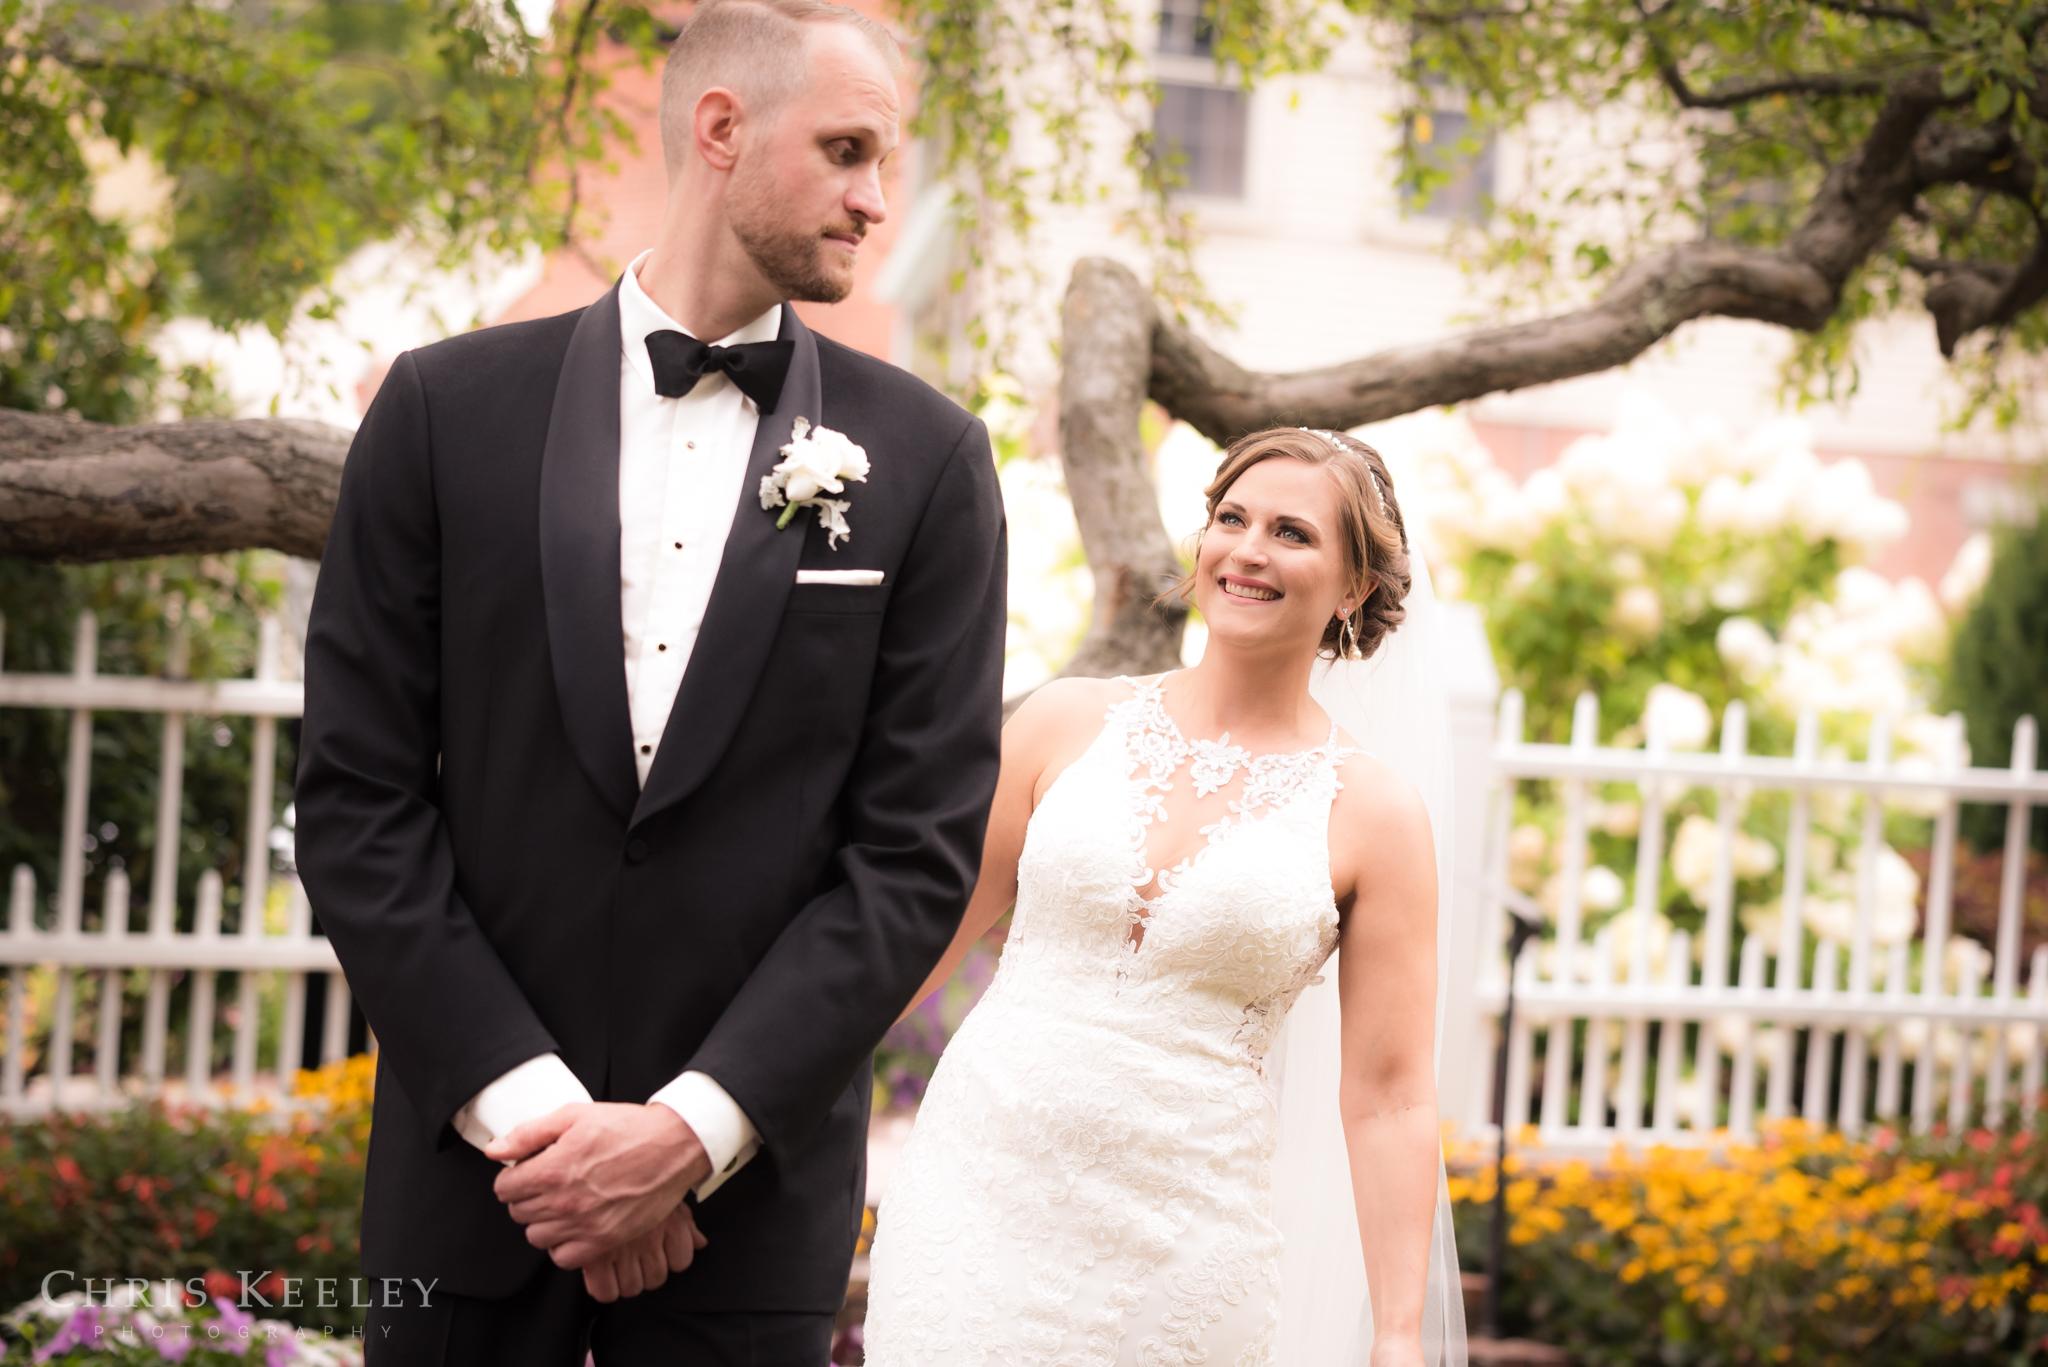 mombo-portsmouth-new-hampshire-wedding-photograper-21.jpg